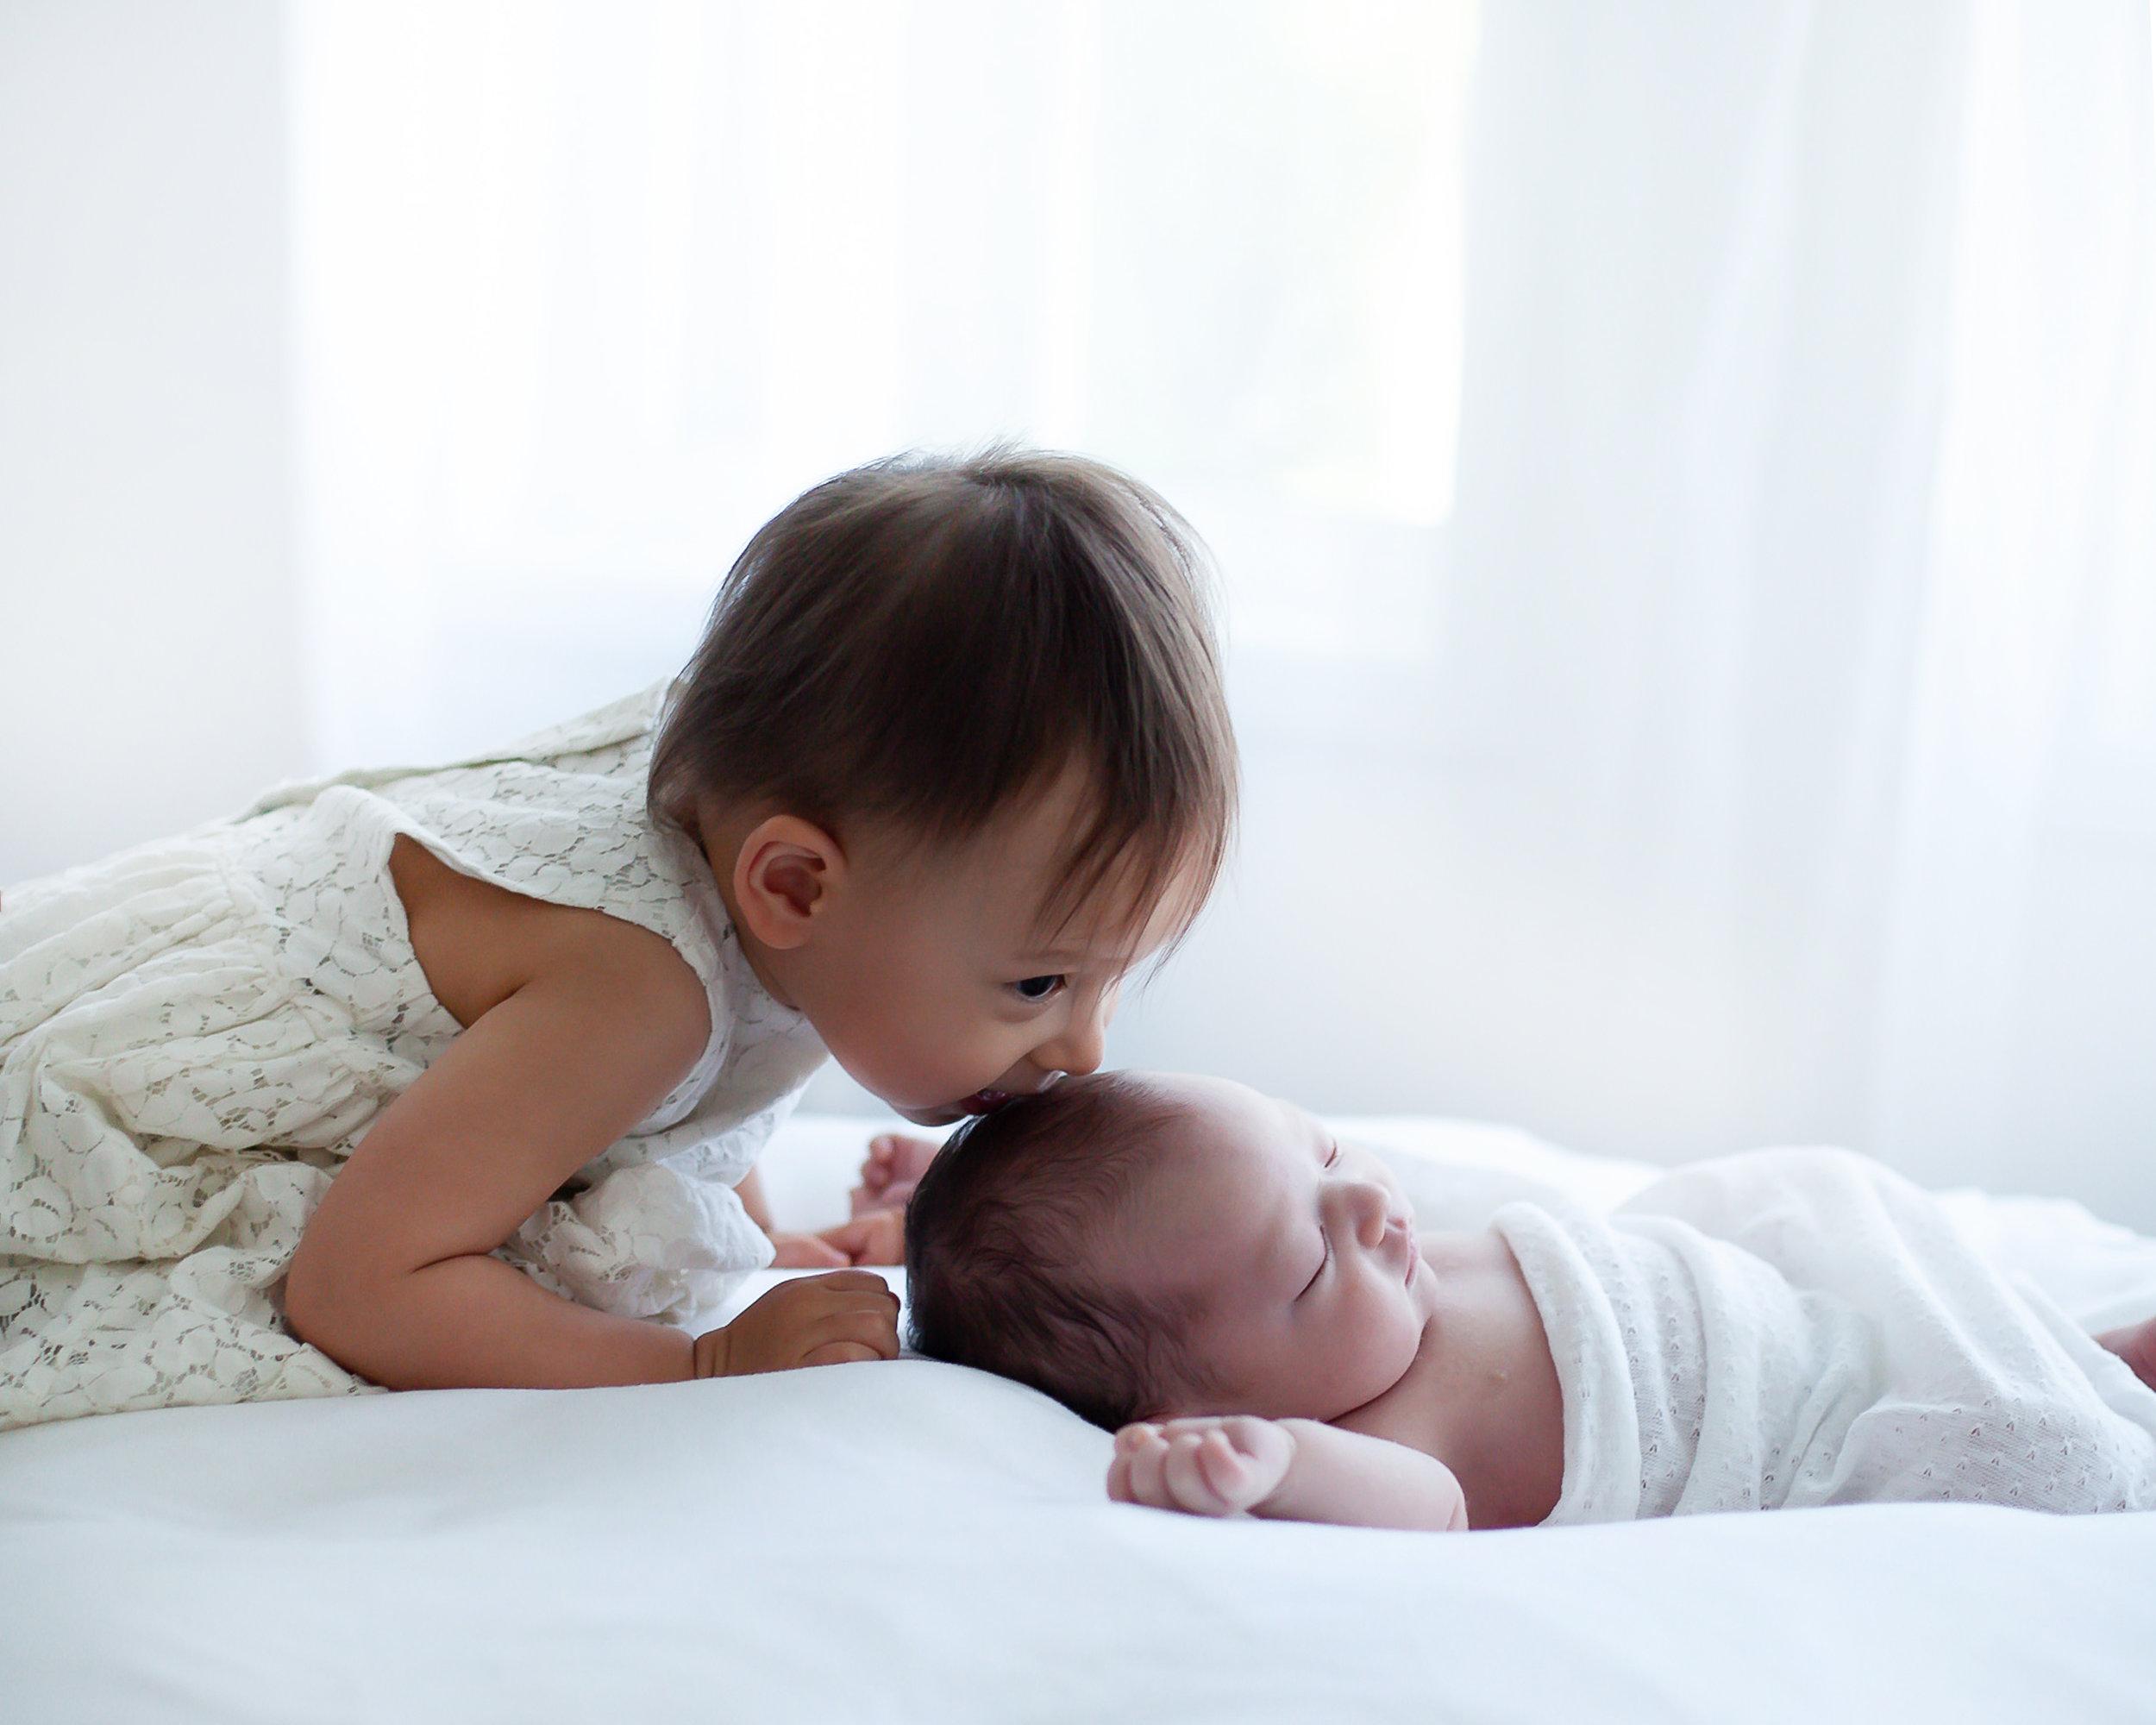 Oshawa_Toronto_Ajax_Sibling_Sisters_Baby_Photography_Studio_Petra_King_Photorgaphy